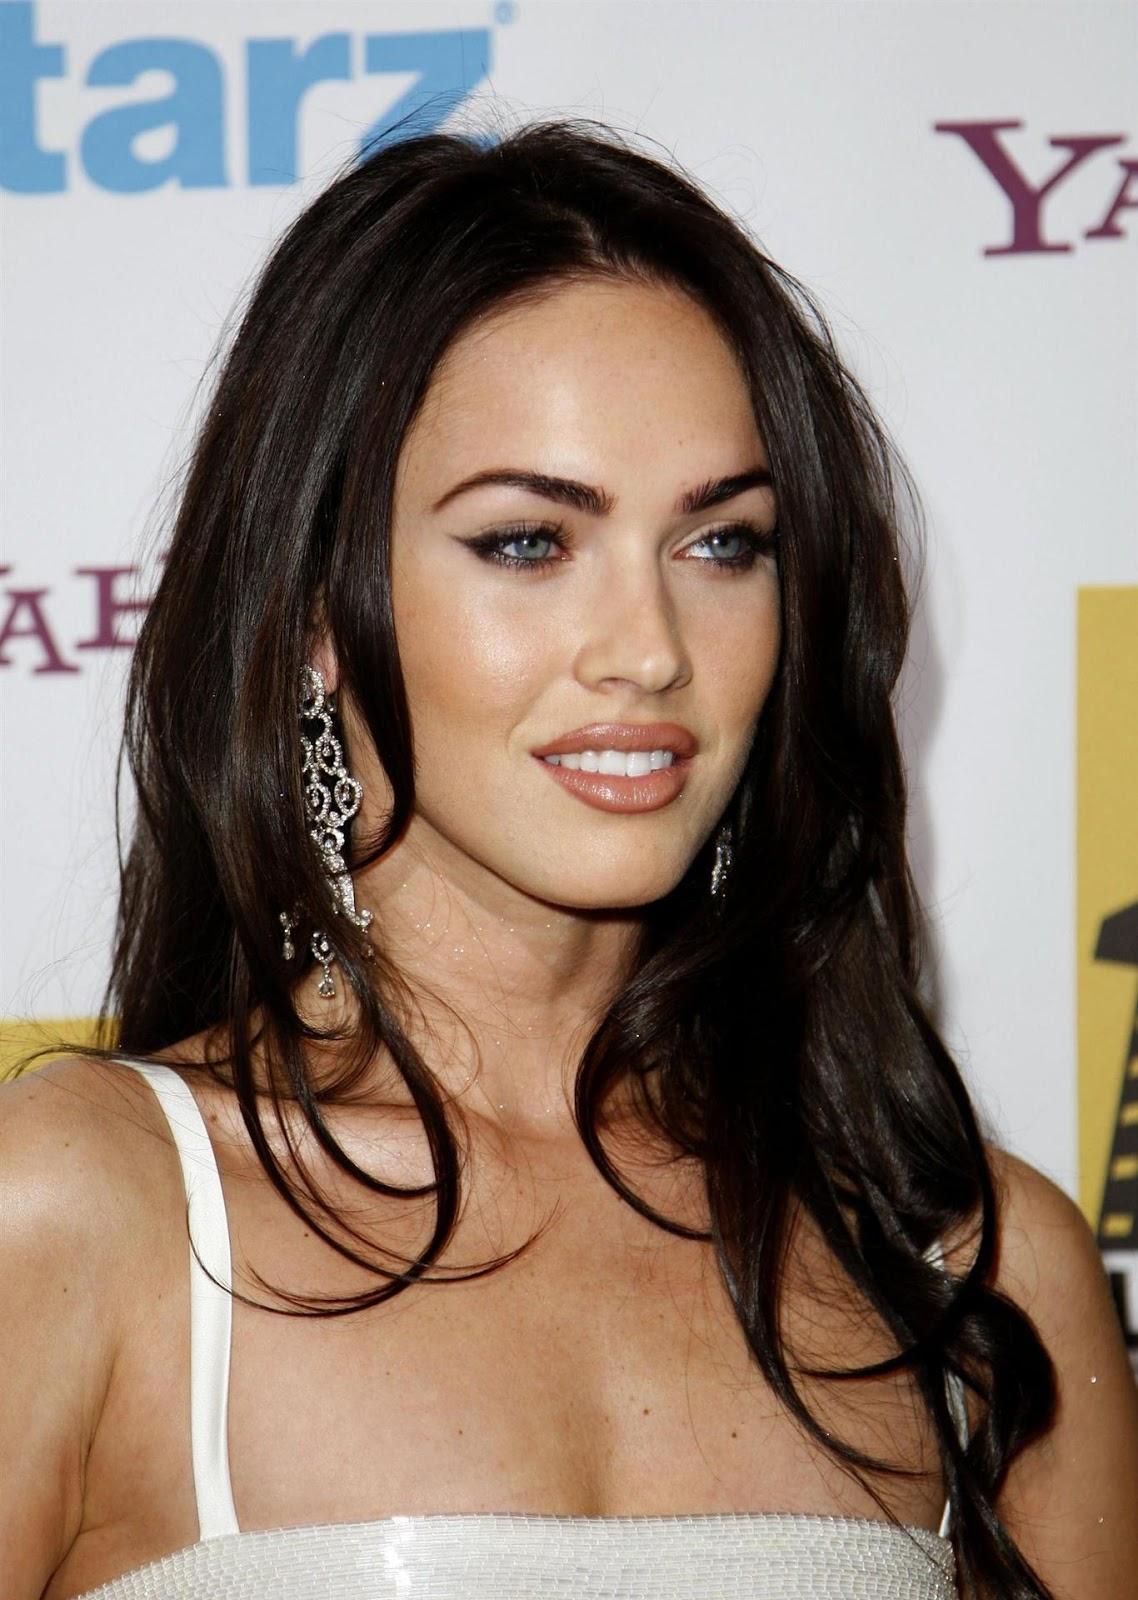 Hollywood Celebrity Gossip: Hollywood popular acctres ...